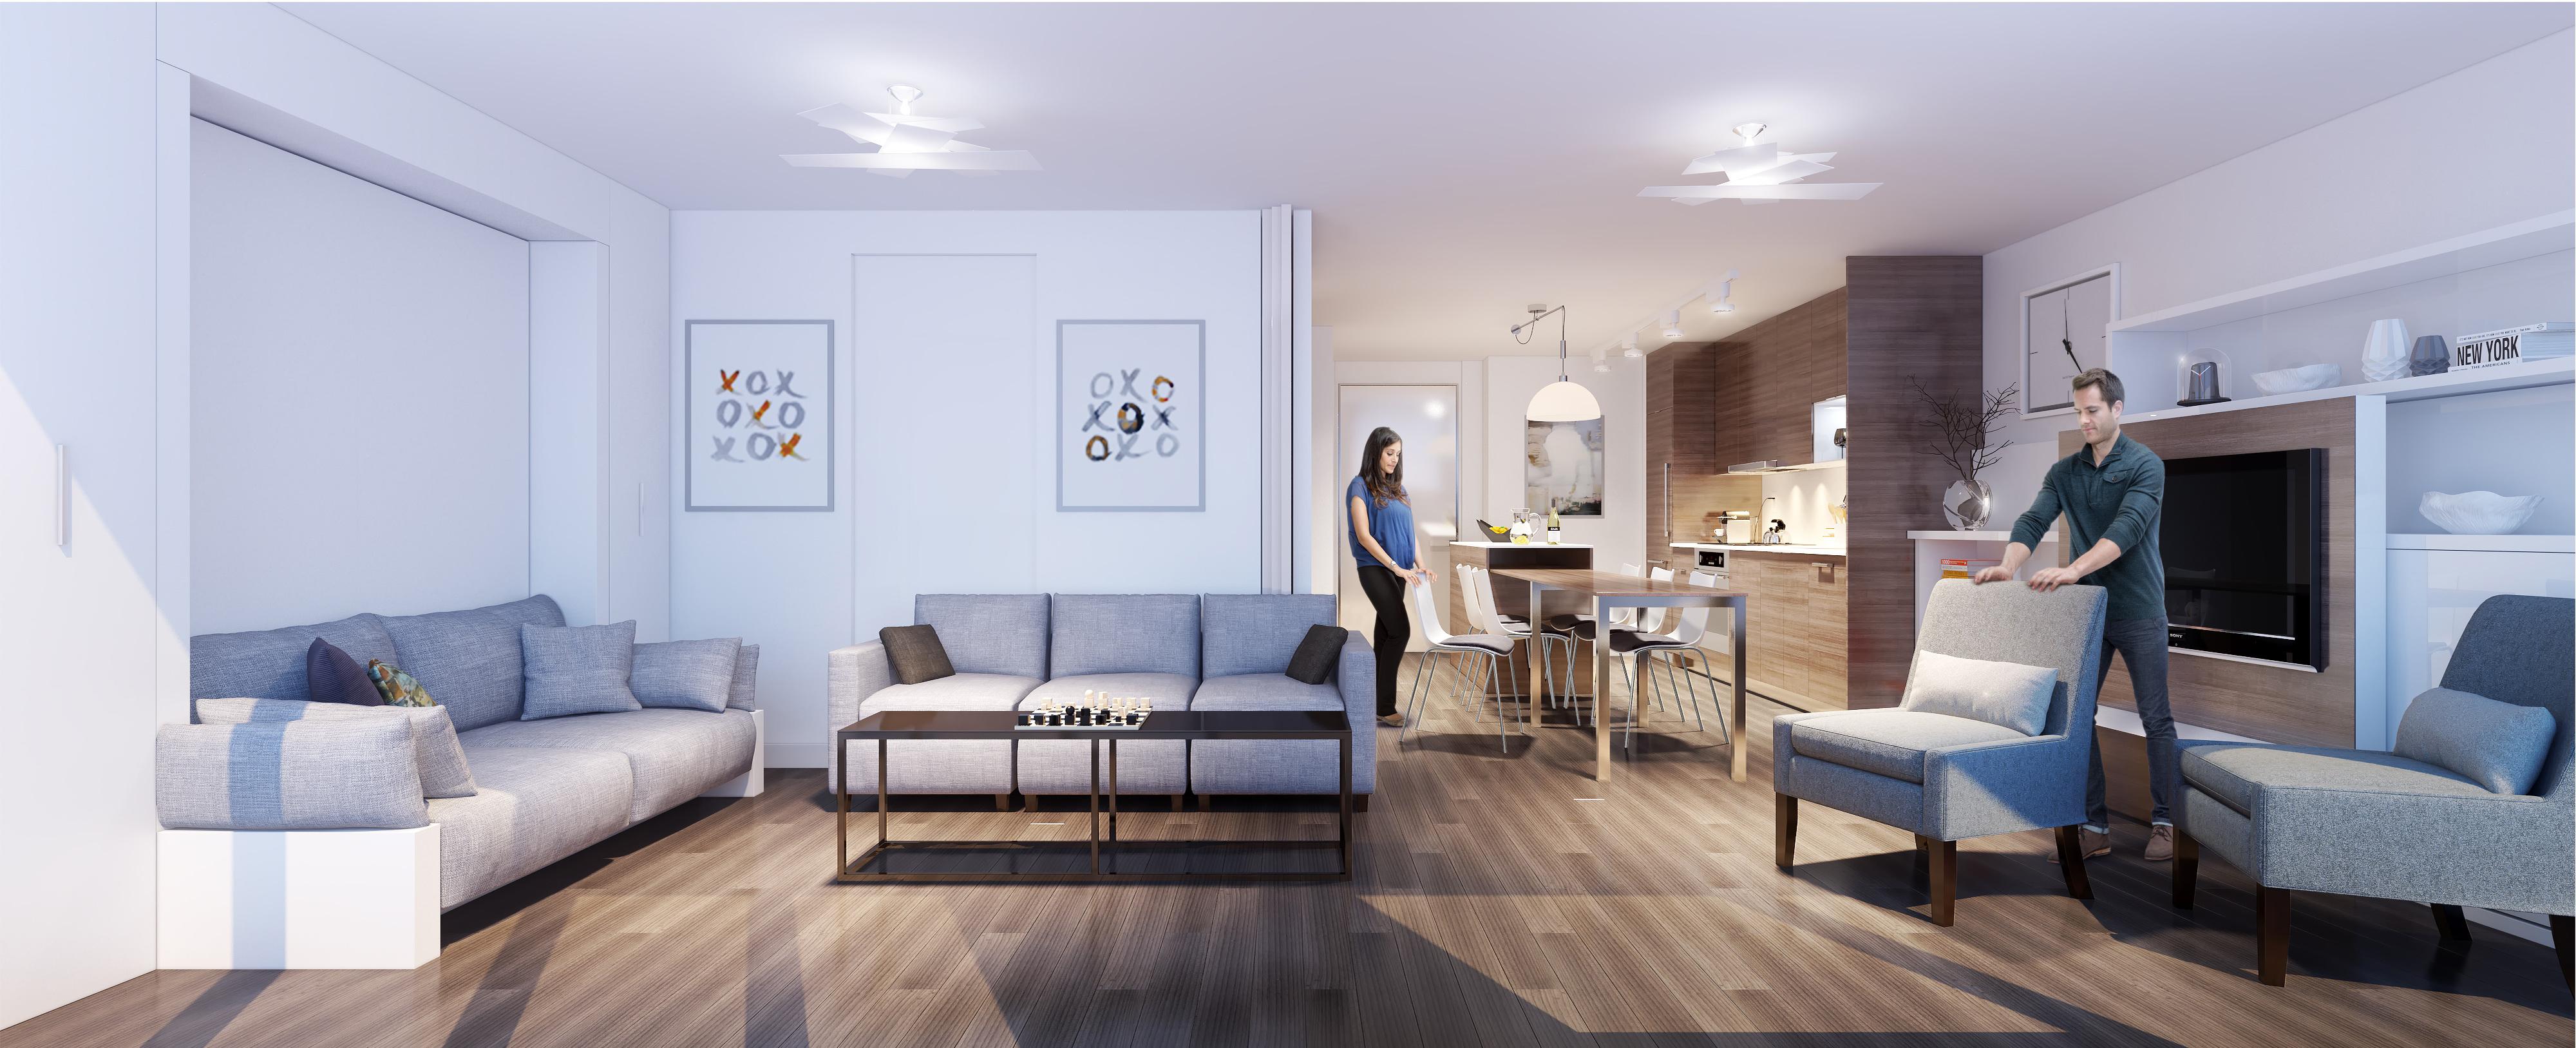 08 4000×1627  Architecture  Pinterest  Architecture Simple One Bedroom Apartment Designs Example Design Ideas